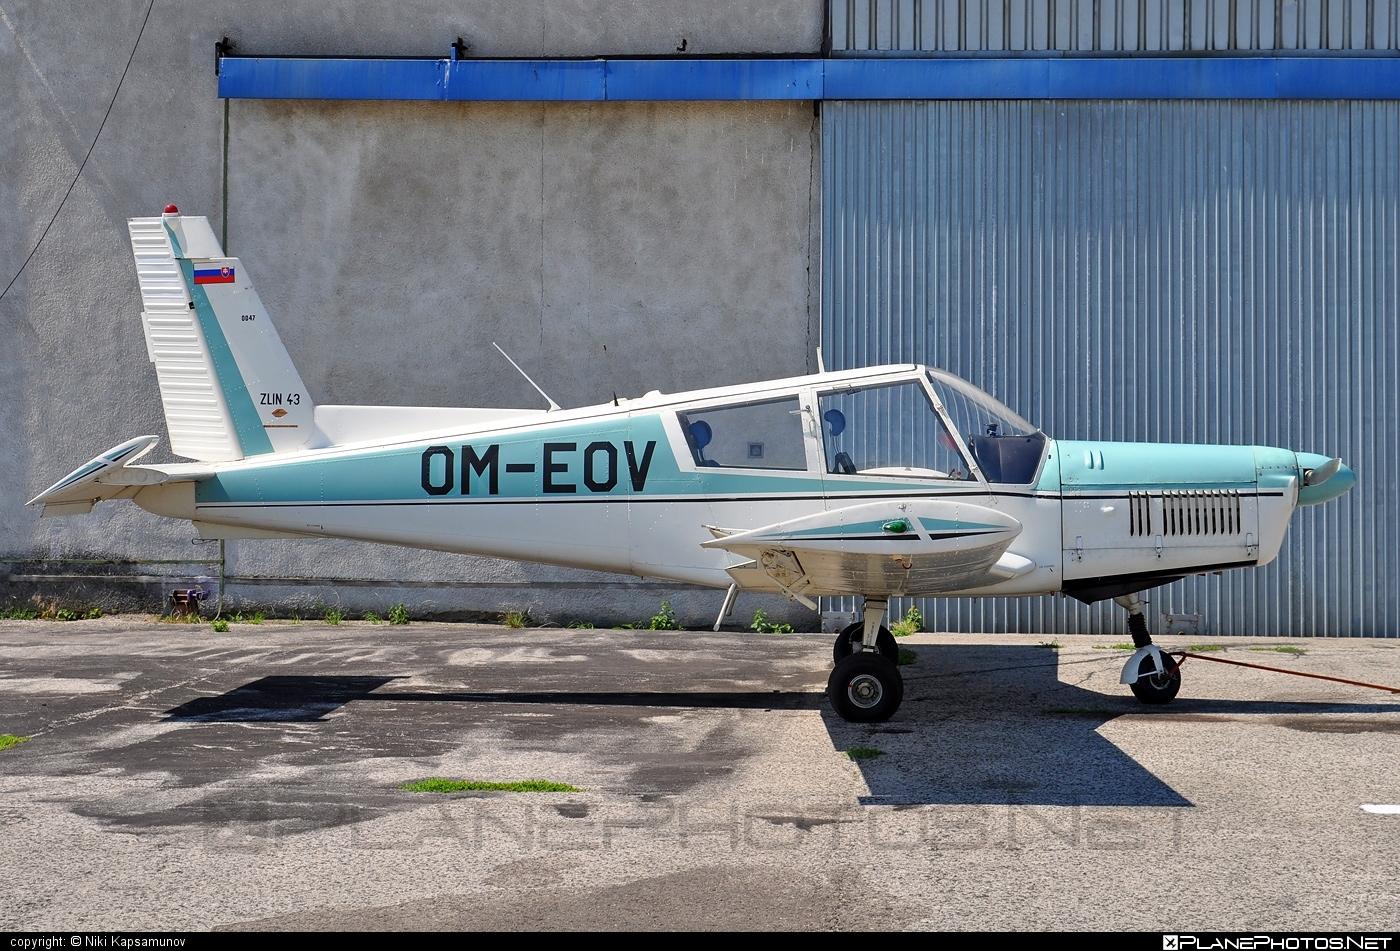 Zlin Z-43 - OM-EOV operated by Aeroklub Trnava #boleraz #z43 #zlin #zlin43